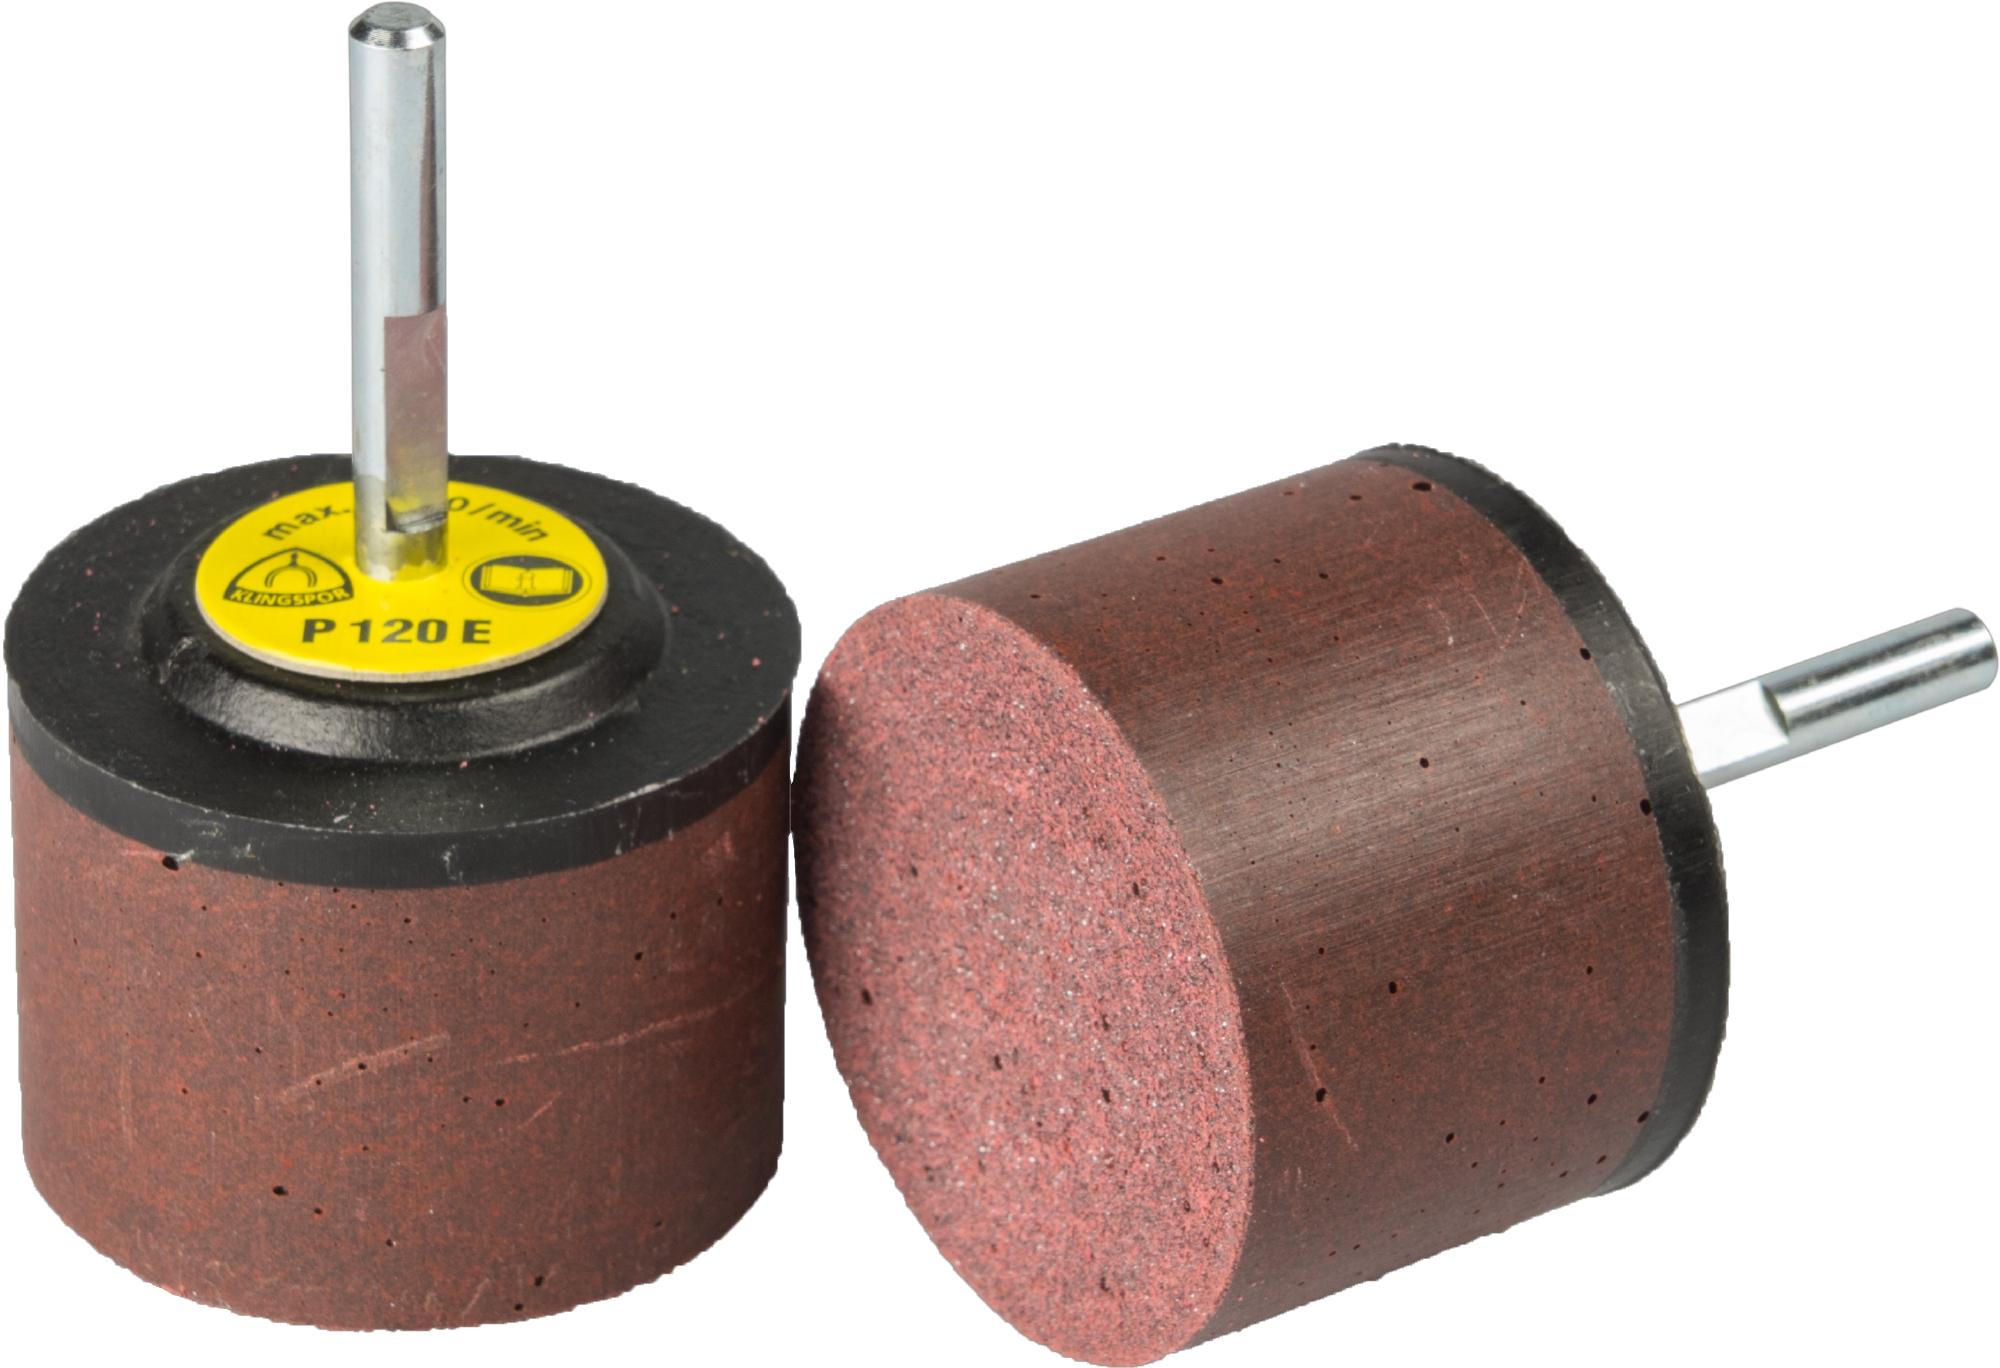 10 x Klingspor RFM 652 R-Flex M.-Stifte, 30 x 30 x 6 mm Korn 120 | 14034